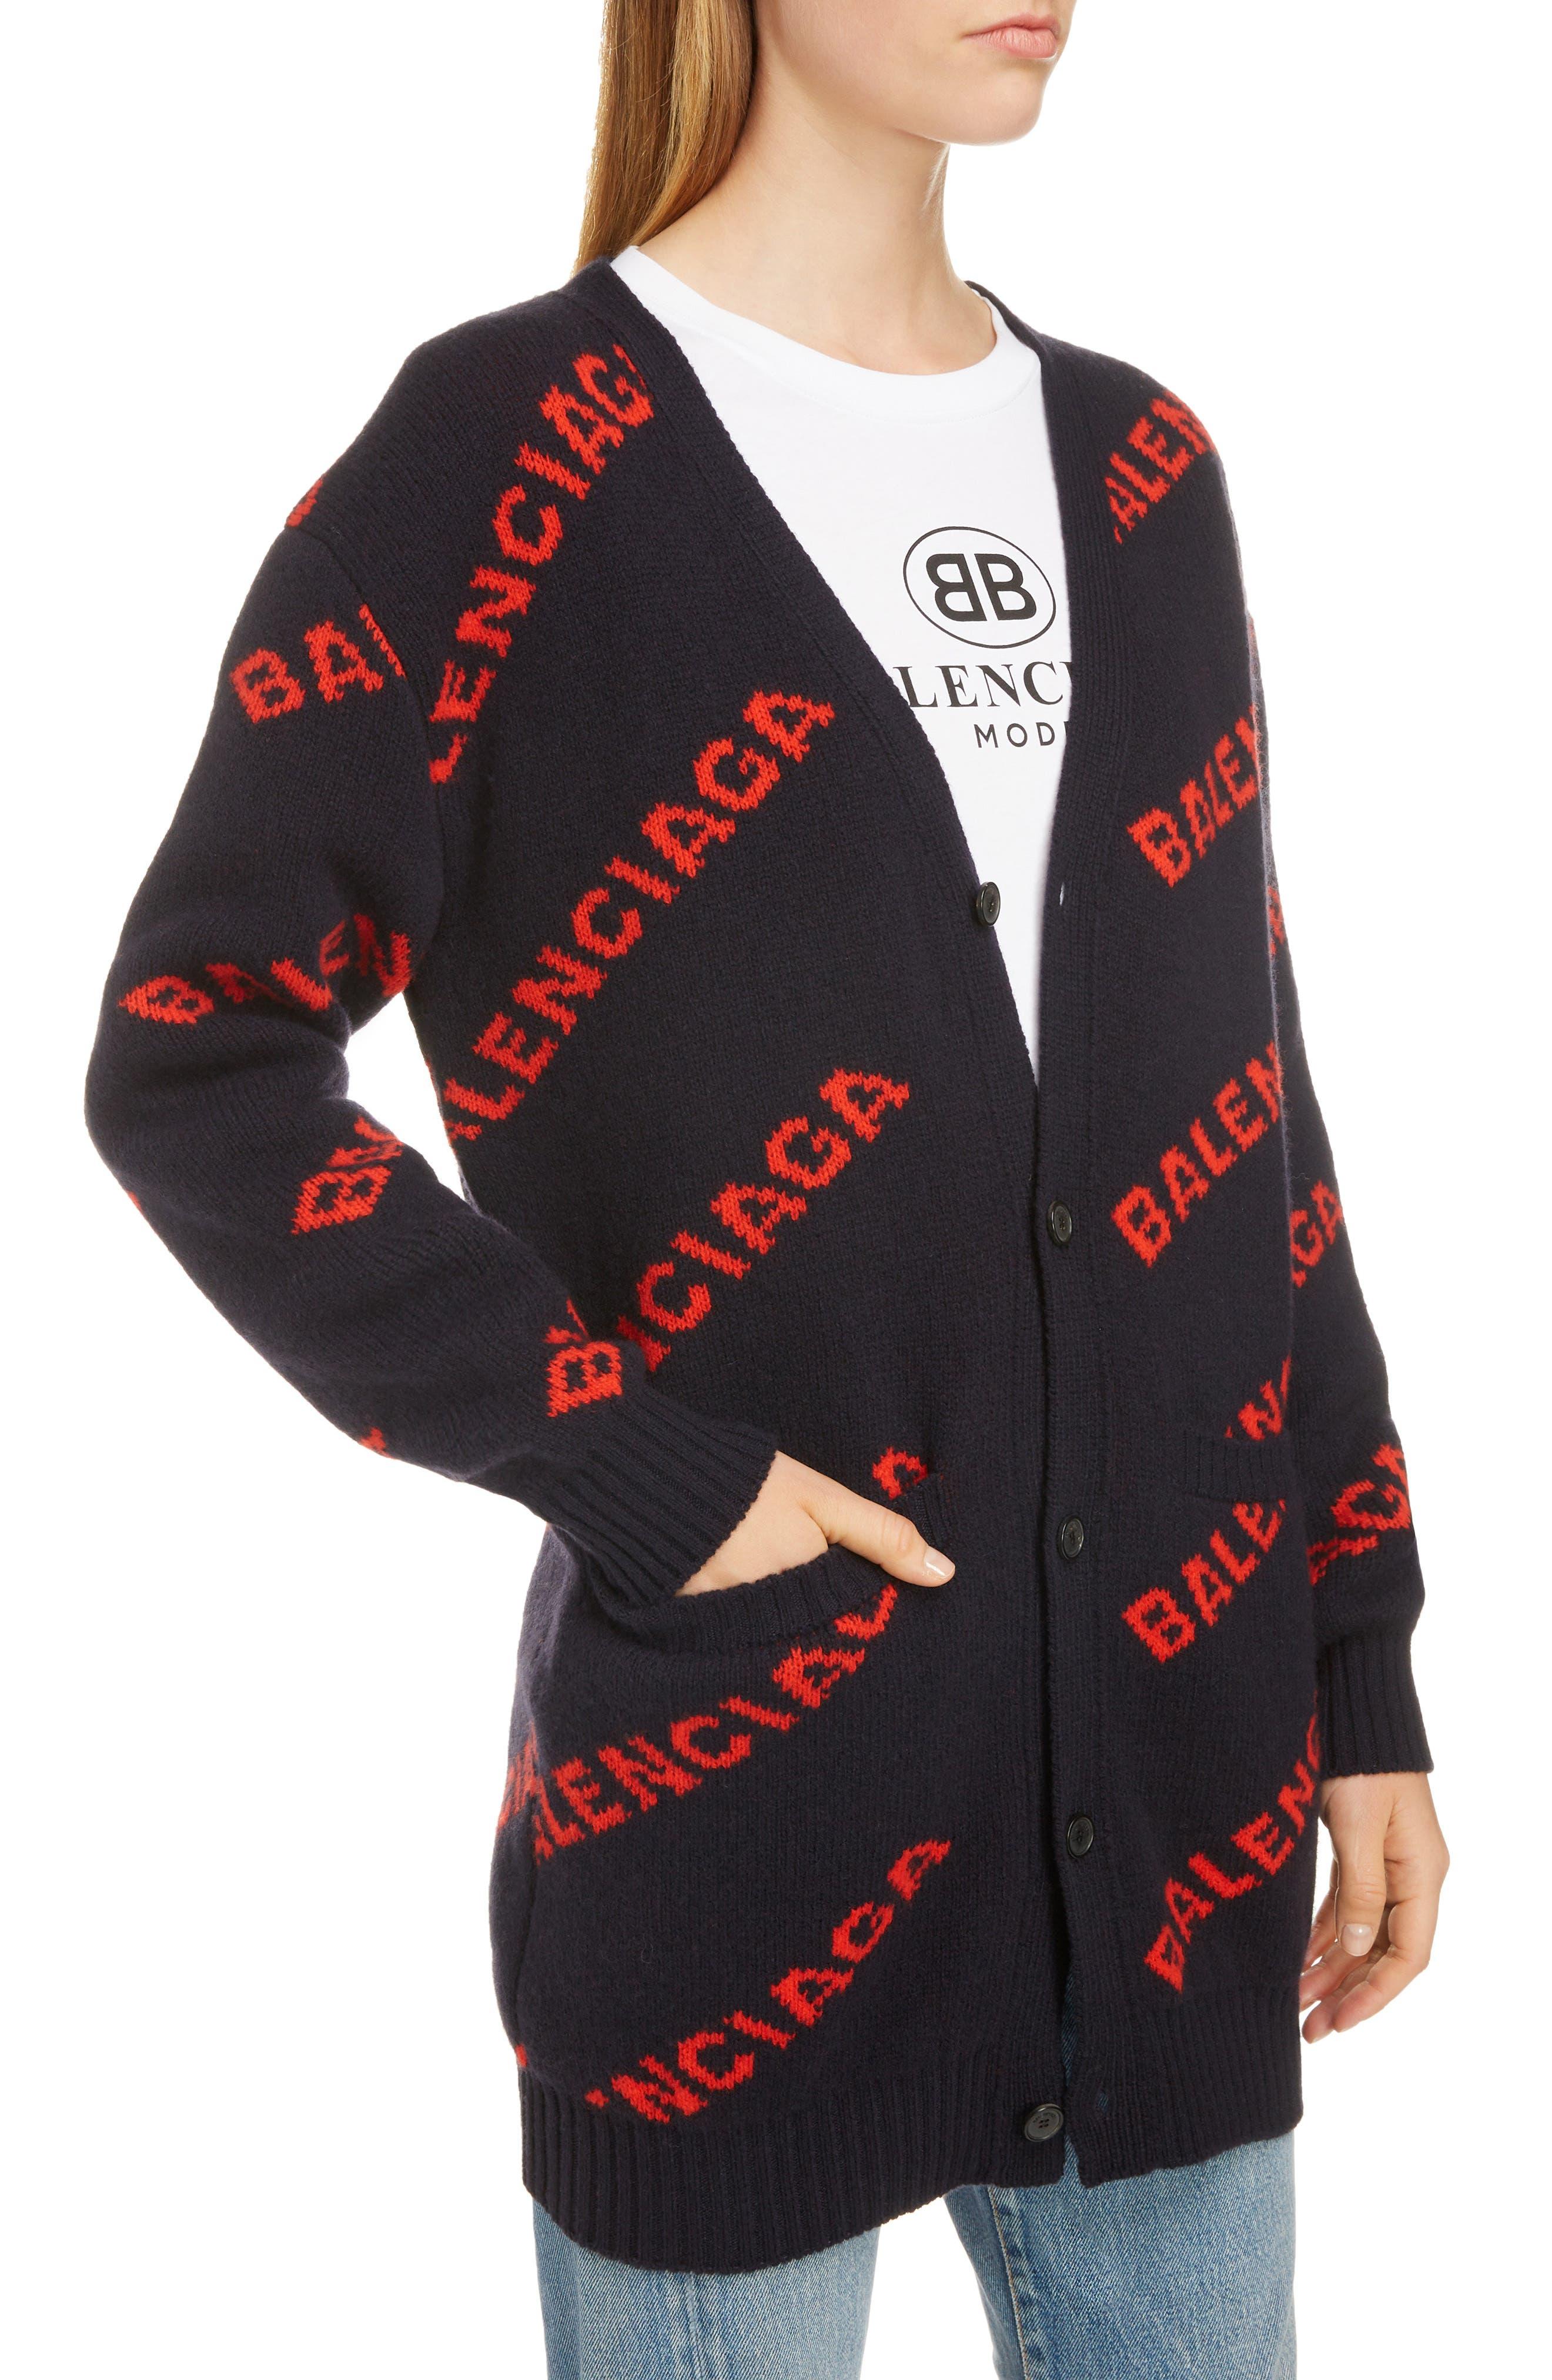 BALENCIAGA, Logo Jacquard Wool Blend Cardigan, Alternate thumbnail 4, color, NAVY/ ORANGE